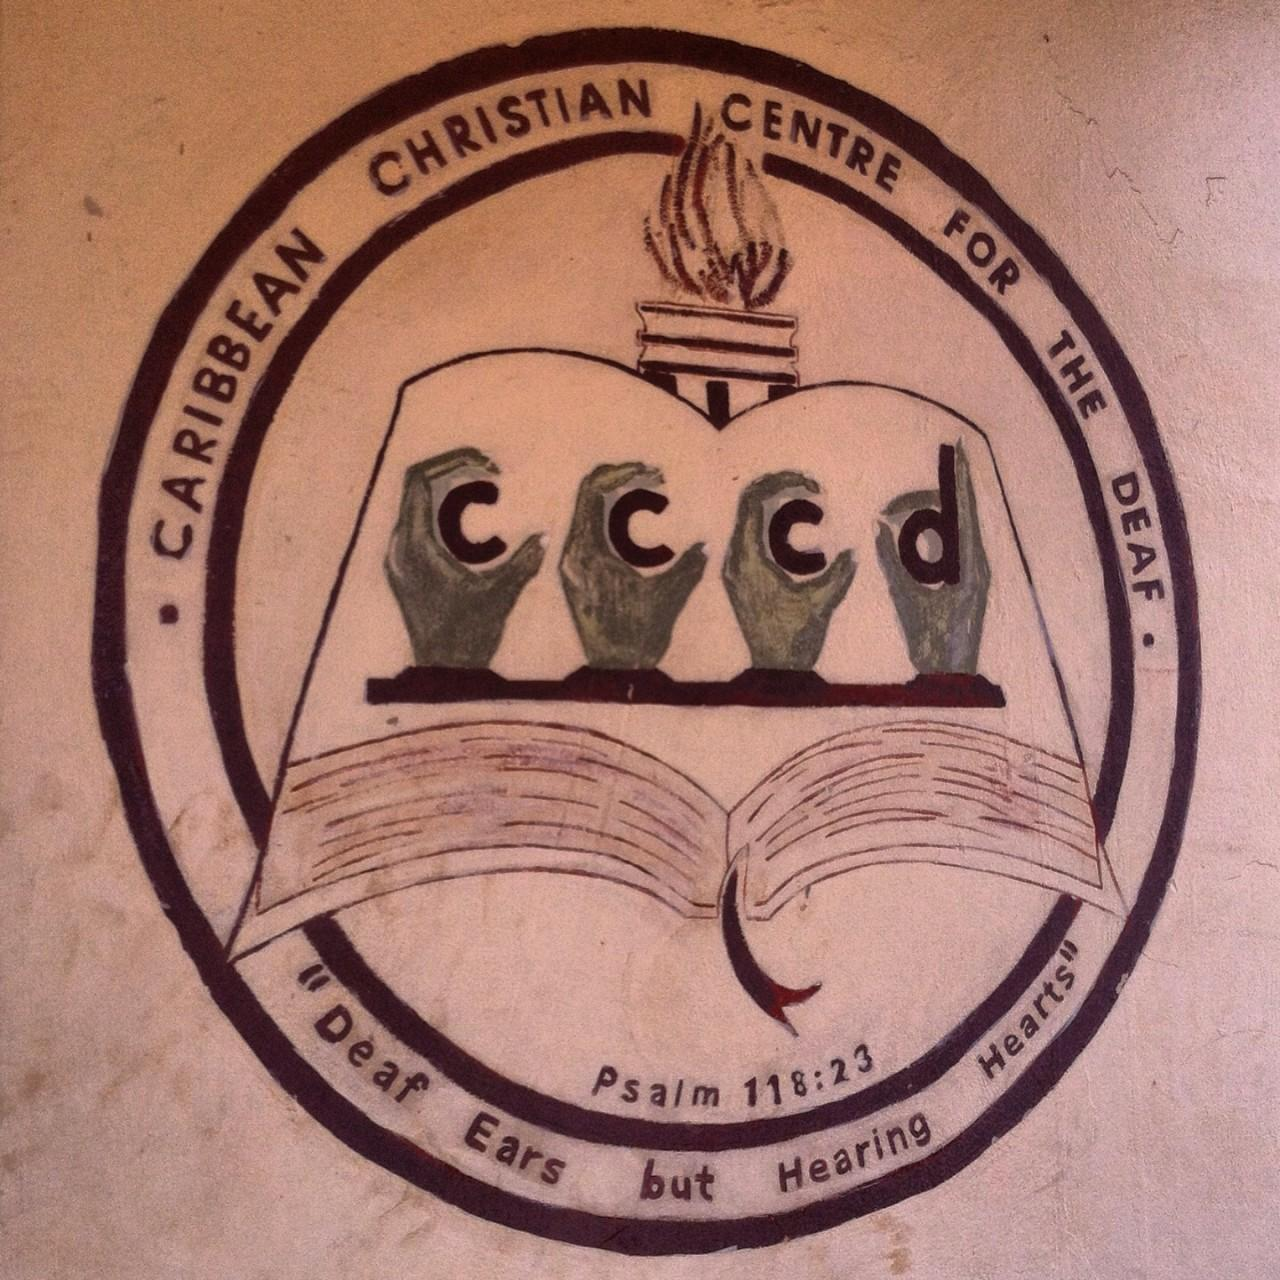 Caribbean Christian Centre for the Deaf logo